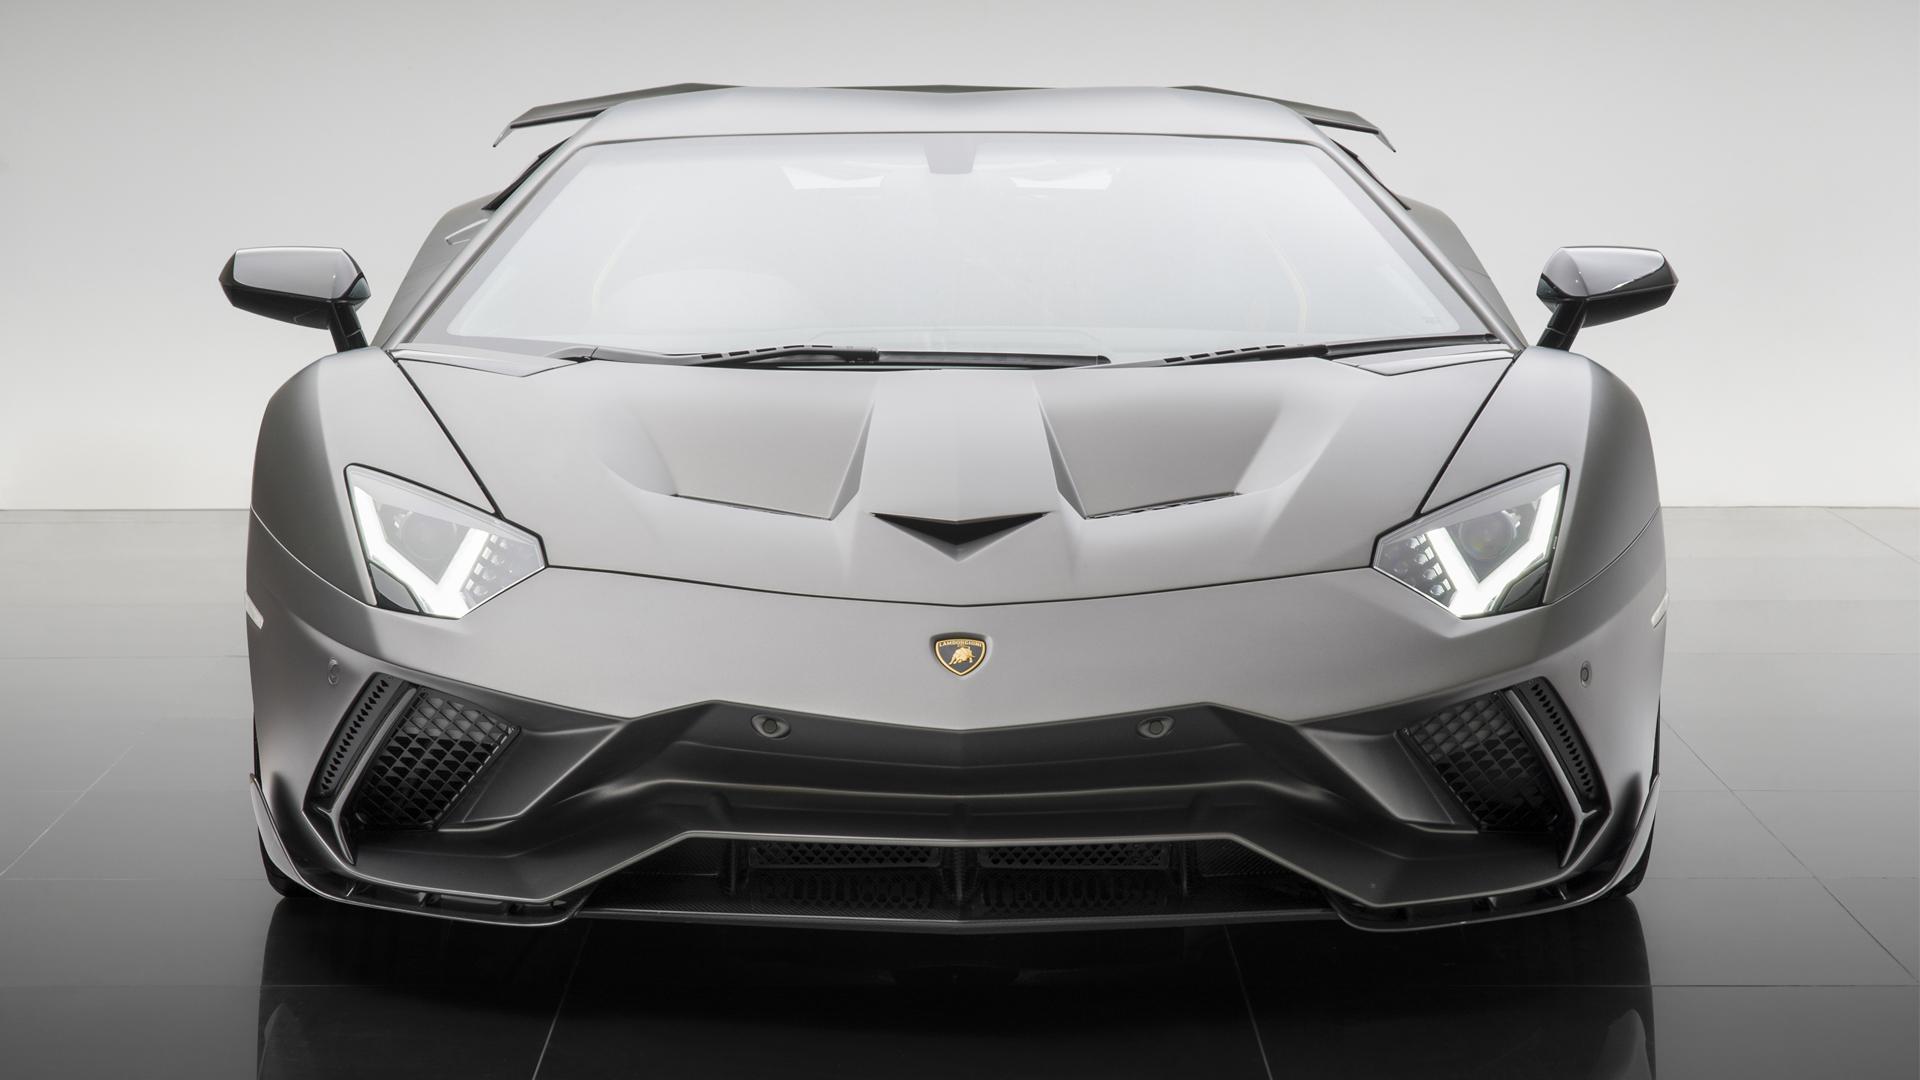 Lamborghini_Aventador_SX_by_Onyx_0000